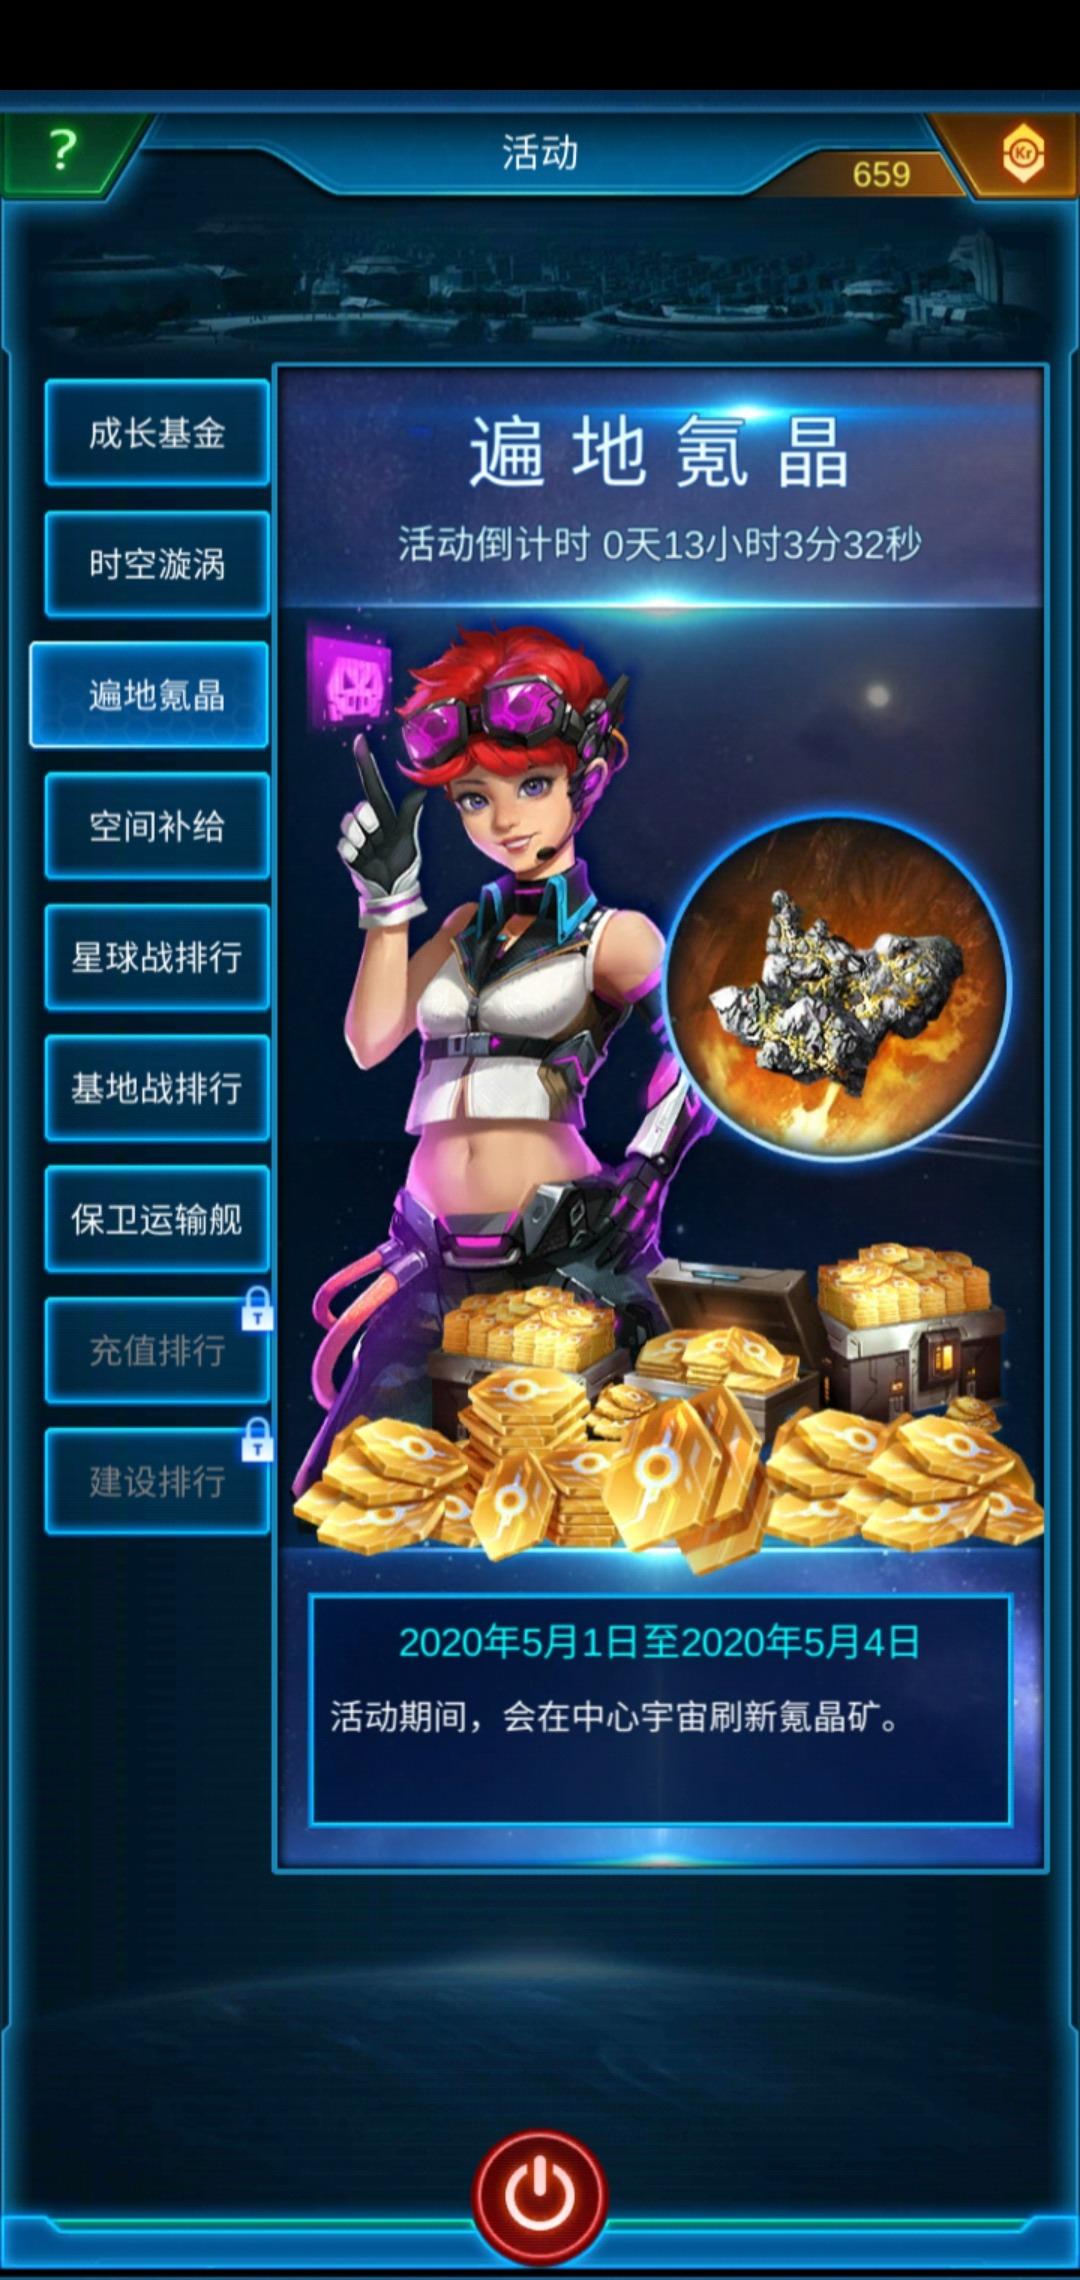 Screenshot_20200503_105627_com.jedigames.p16s.huawei.jpg